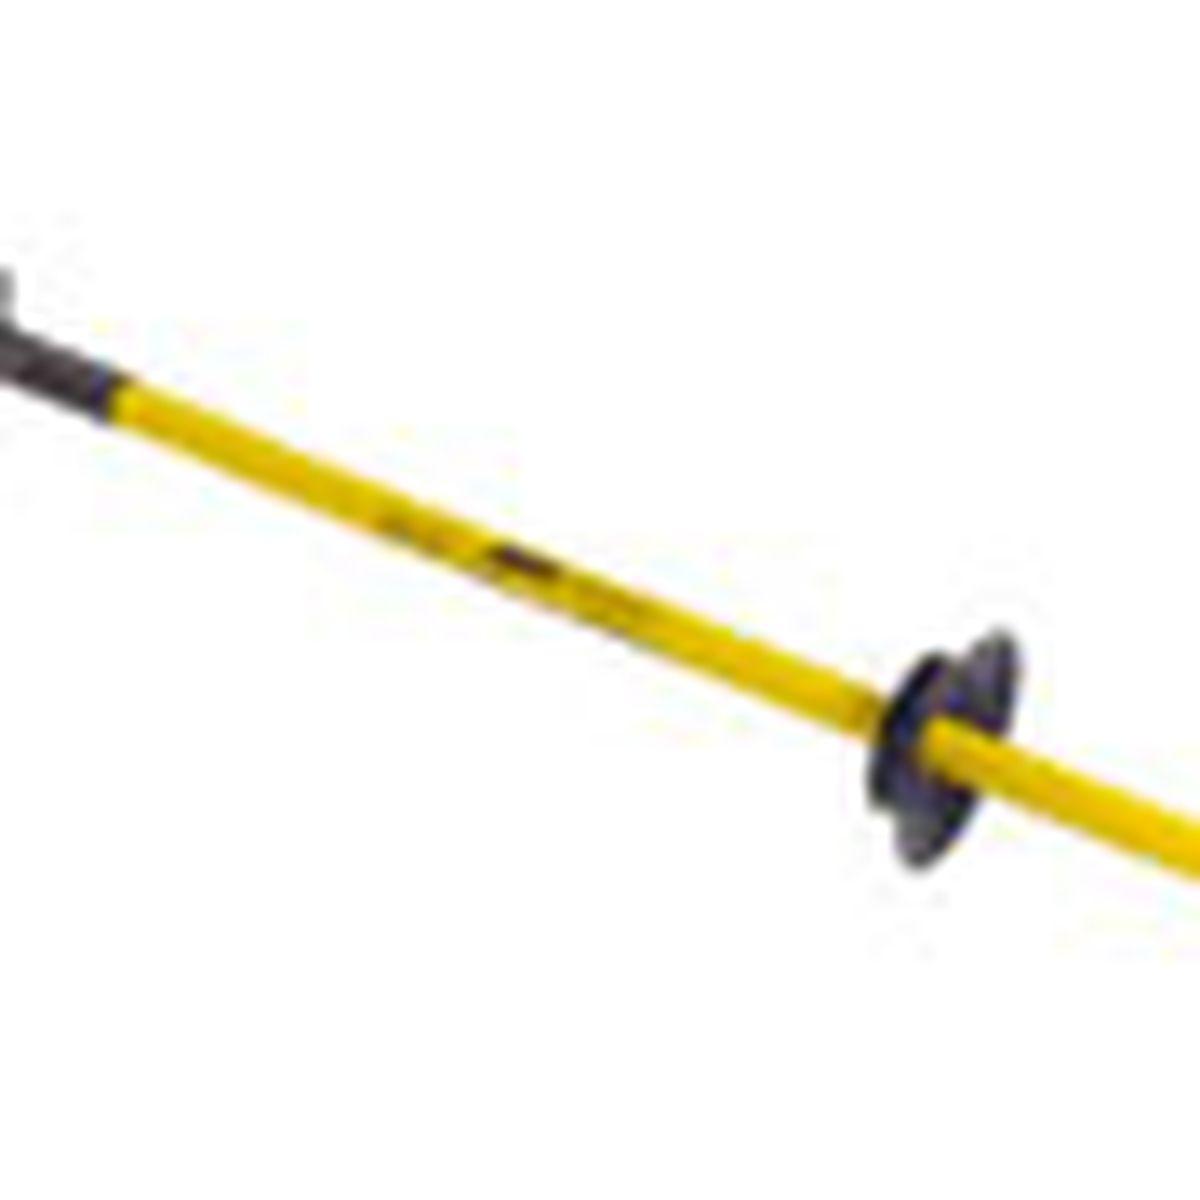 compressed-air excavation tool